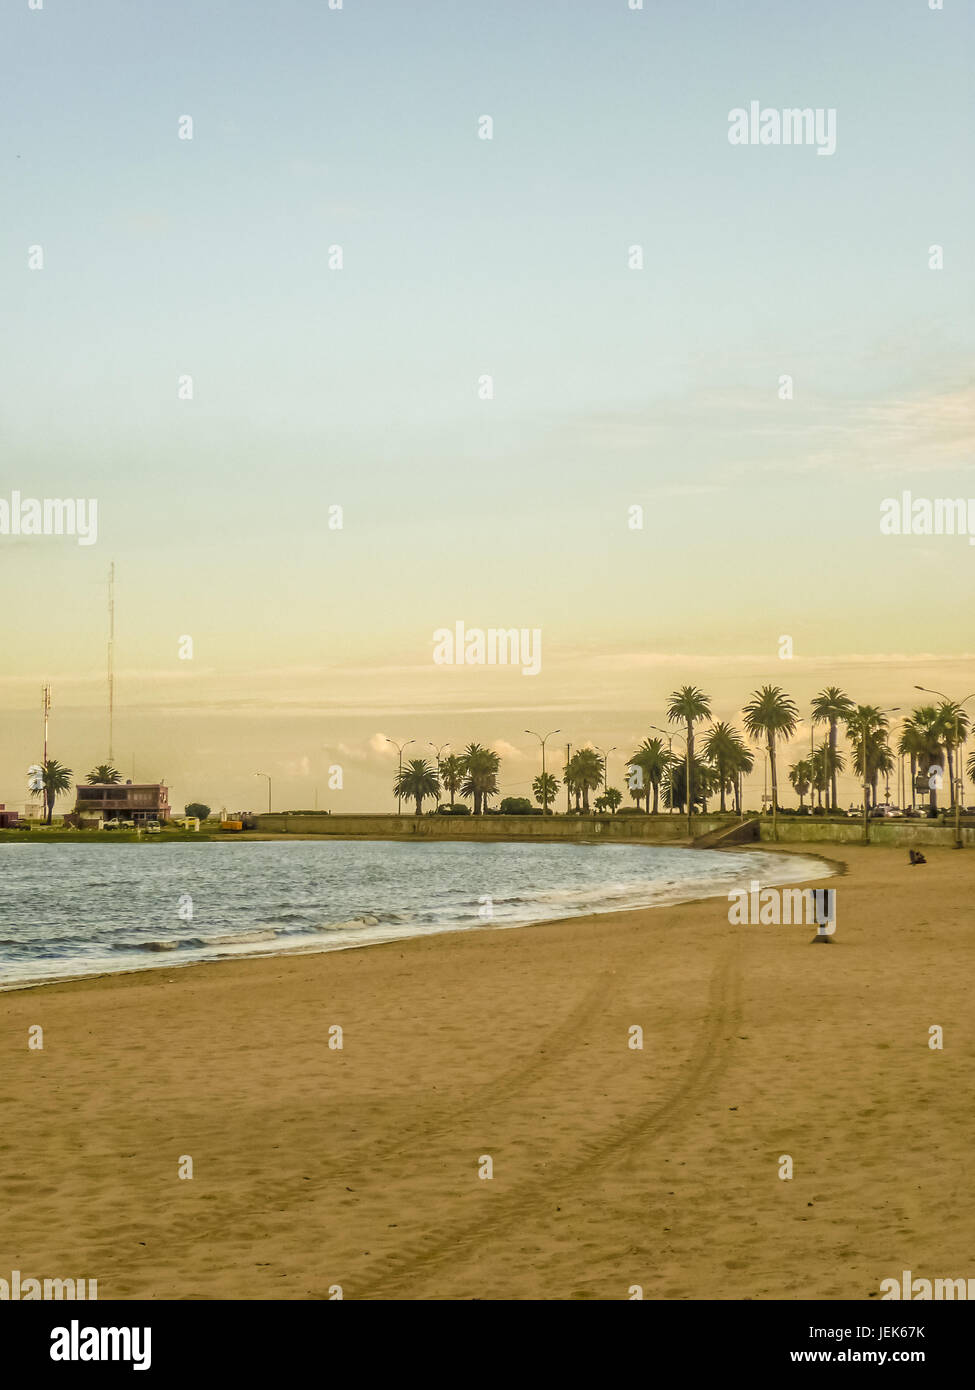 Playa vacía de Montevideo en Uruguay Imagen De Stock